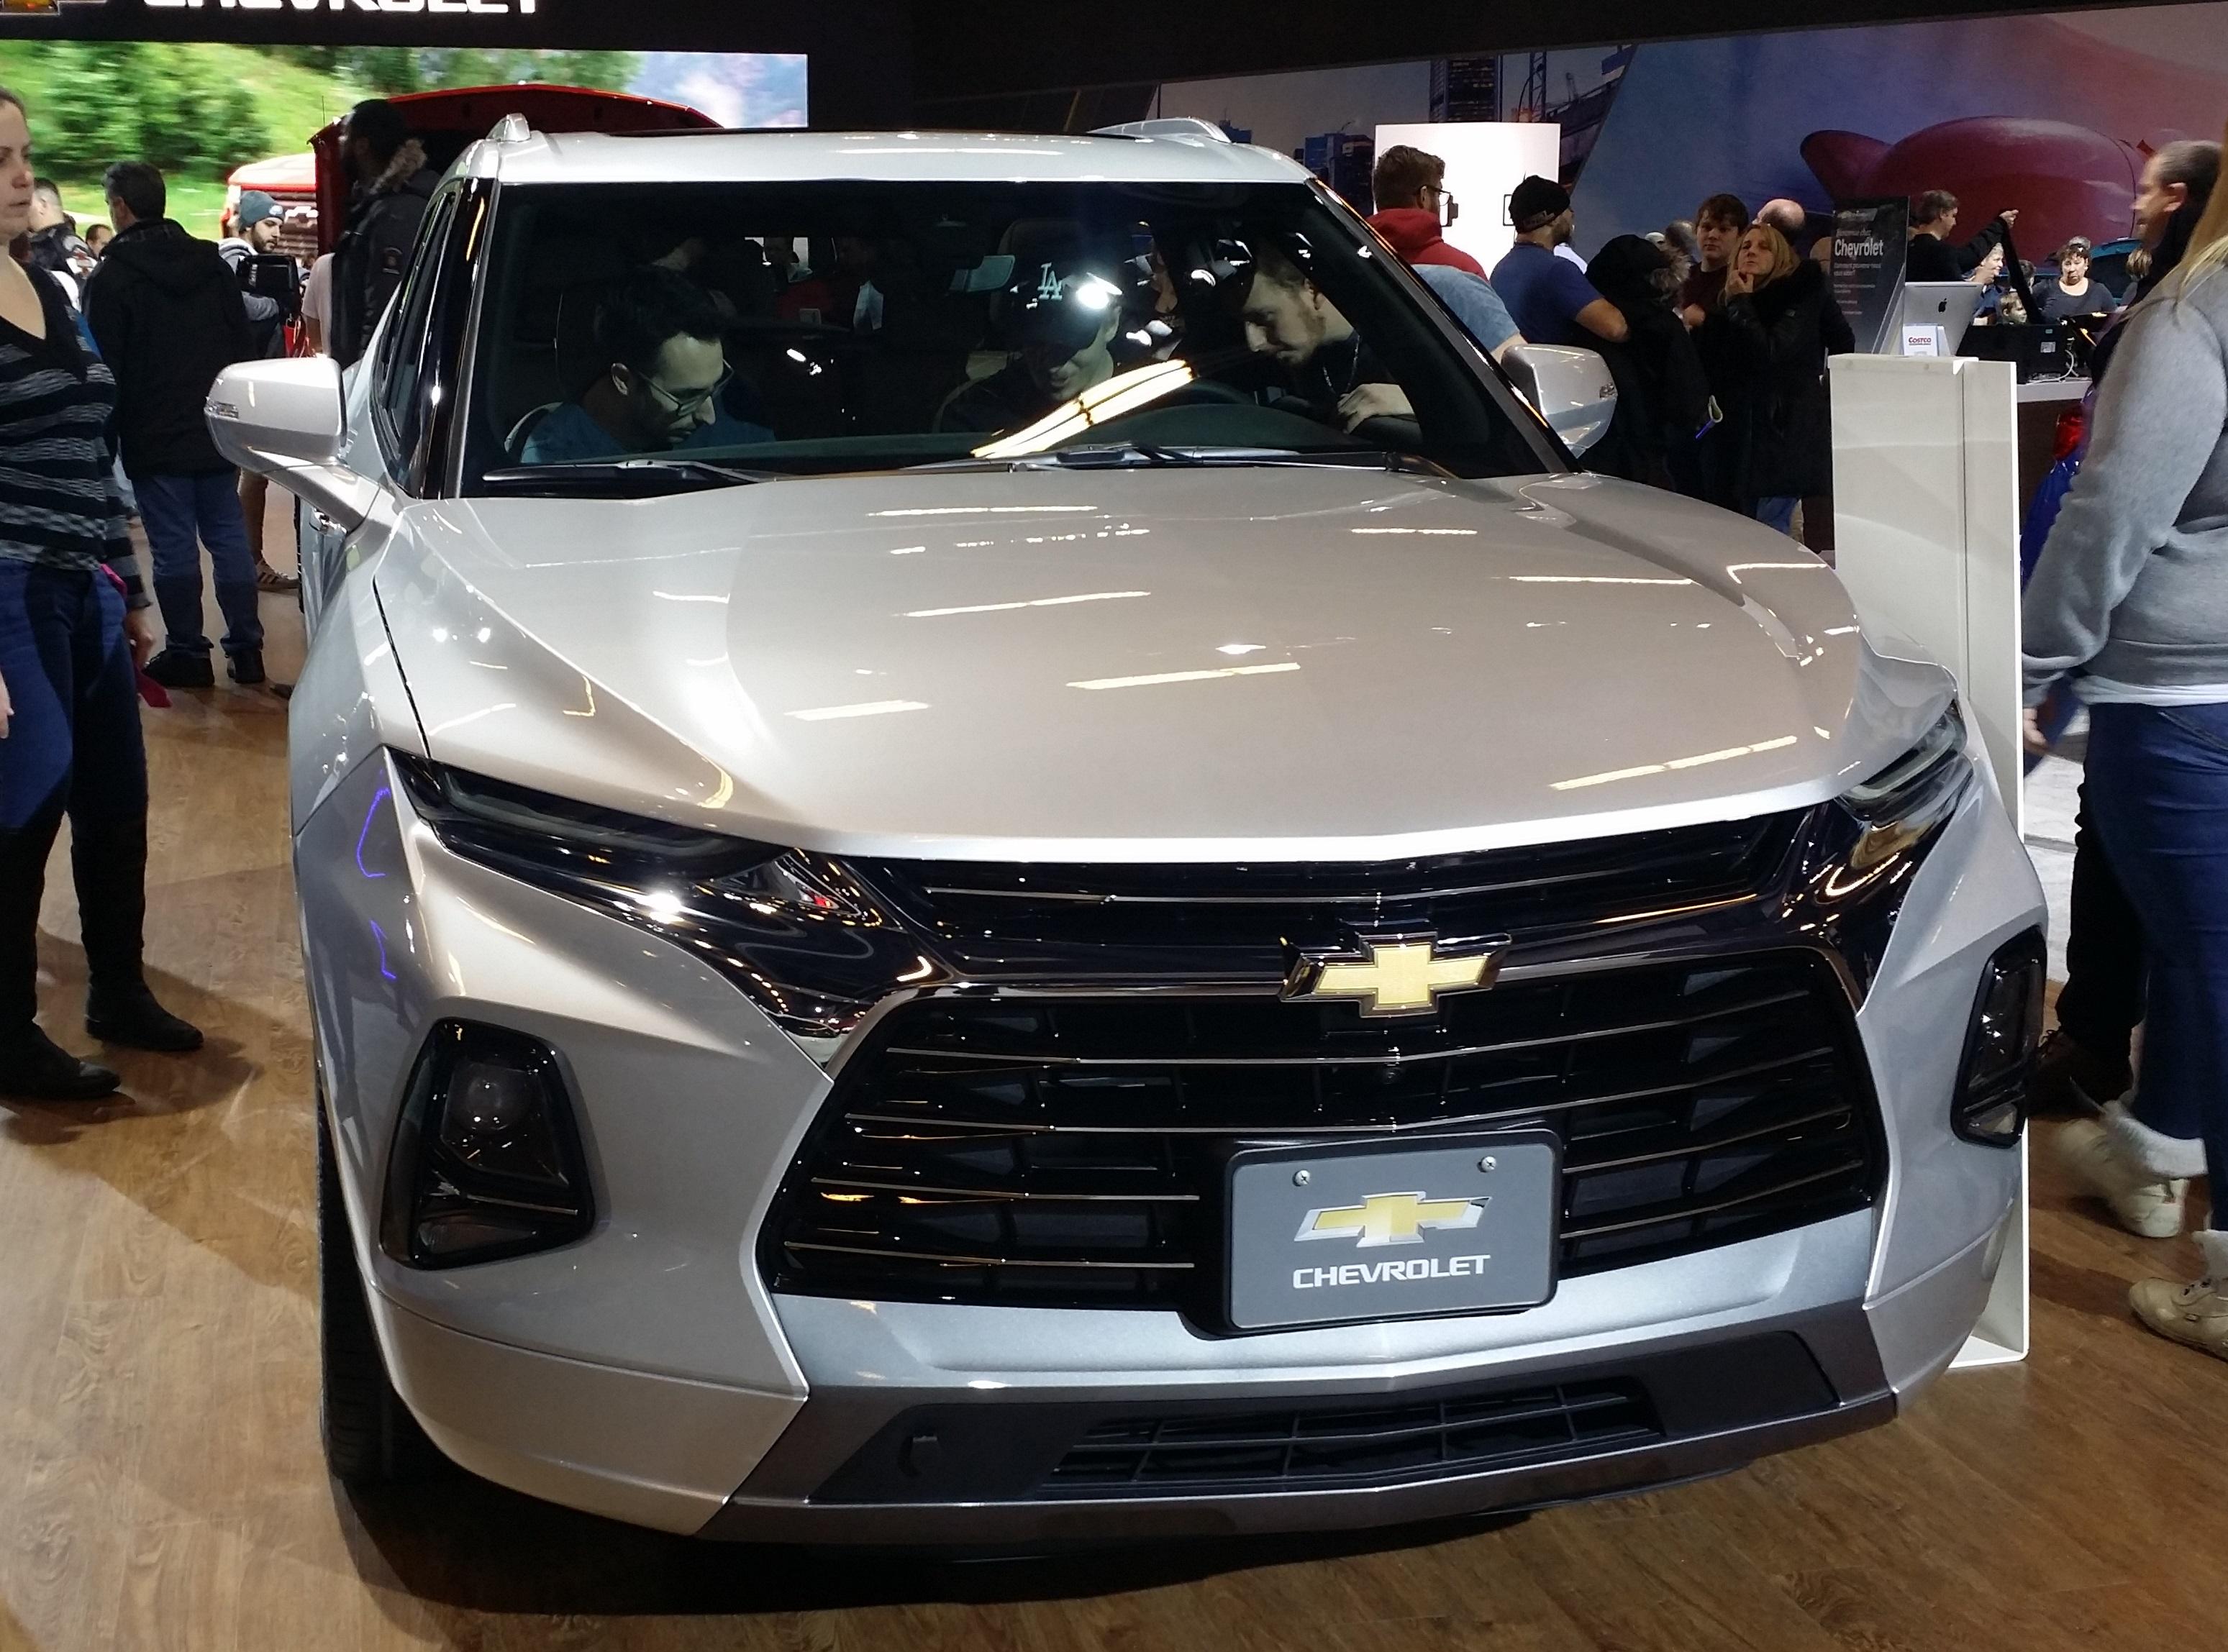 File:Chevrolet Blazer 2019 au SIAM 2019.jpg - Wikipedia